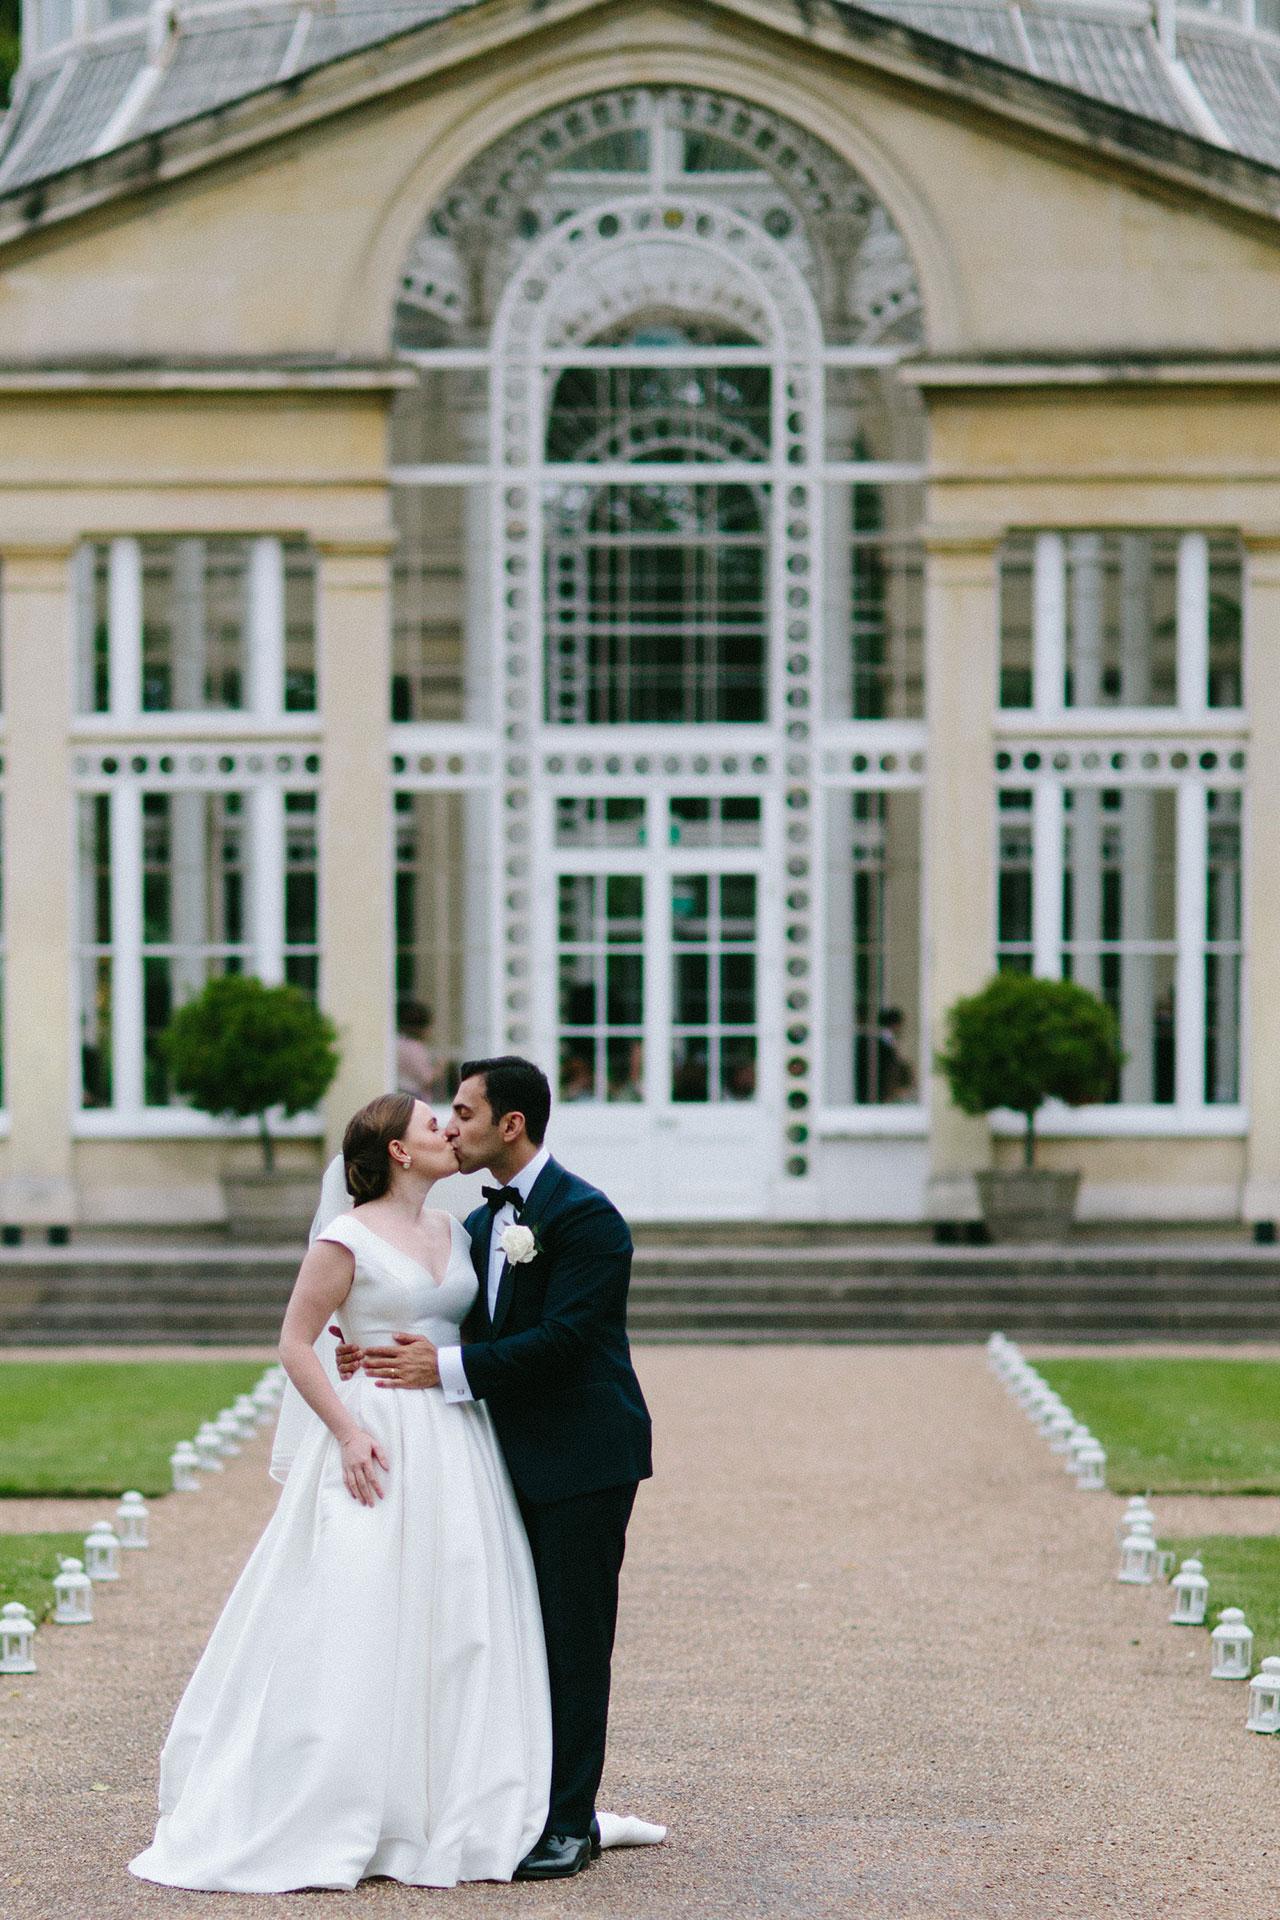 Syon-Park-Wedding-Photographer--_-Michael-Newington-Gray-432.jpg